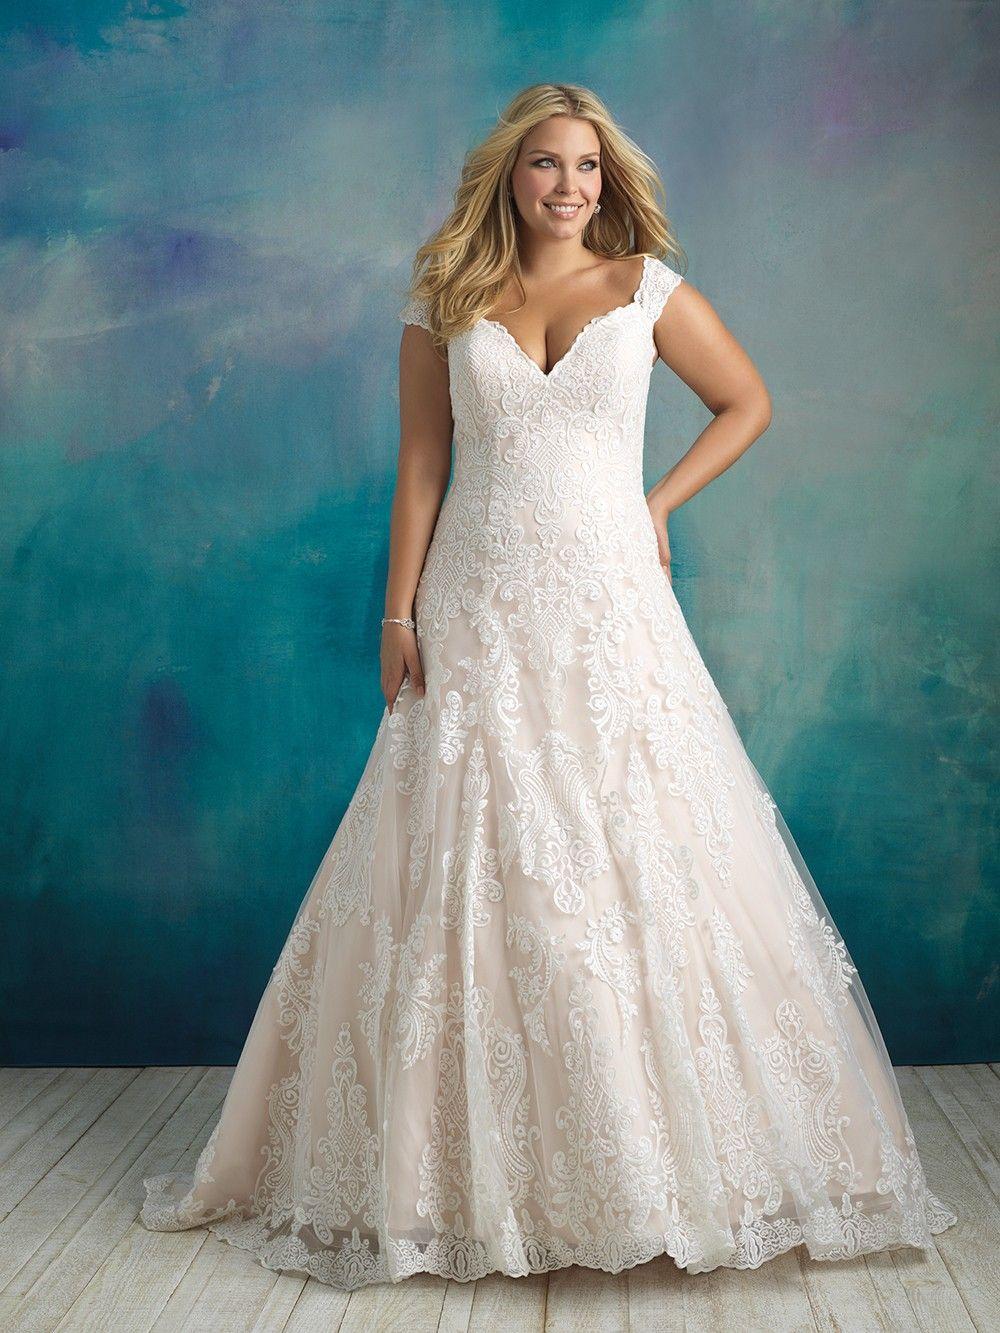 Allure Bridals Dress Style W416 Weddingdresses Wedding Bride Allurebridals Allure Plussize Allure Bridal Allure Wedding Dresses Plus Wedding Dresses [ 1333 x 1000 Pixel ]